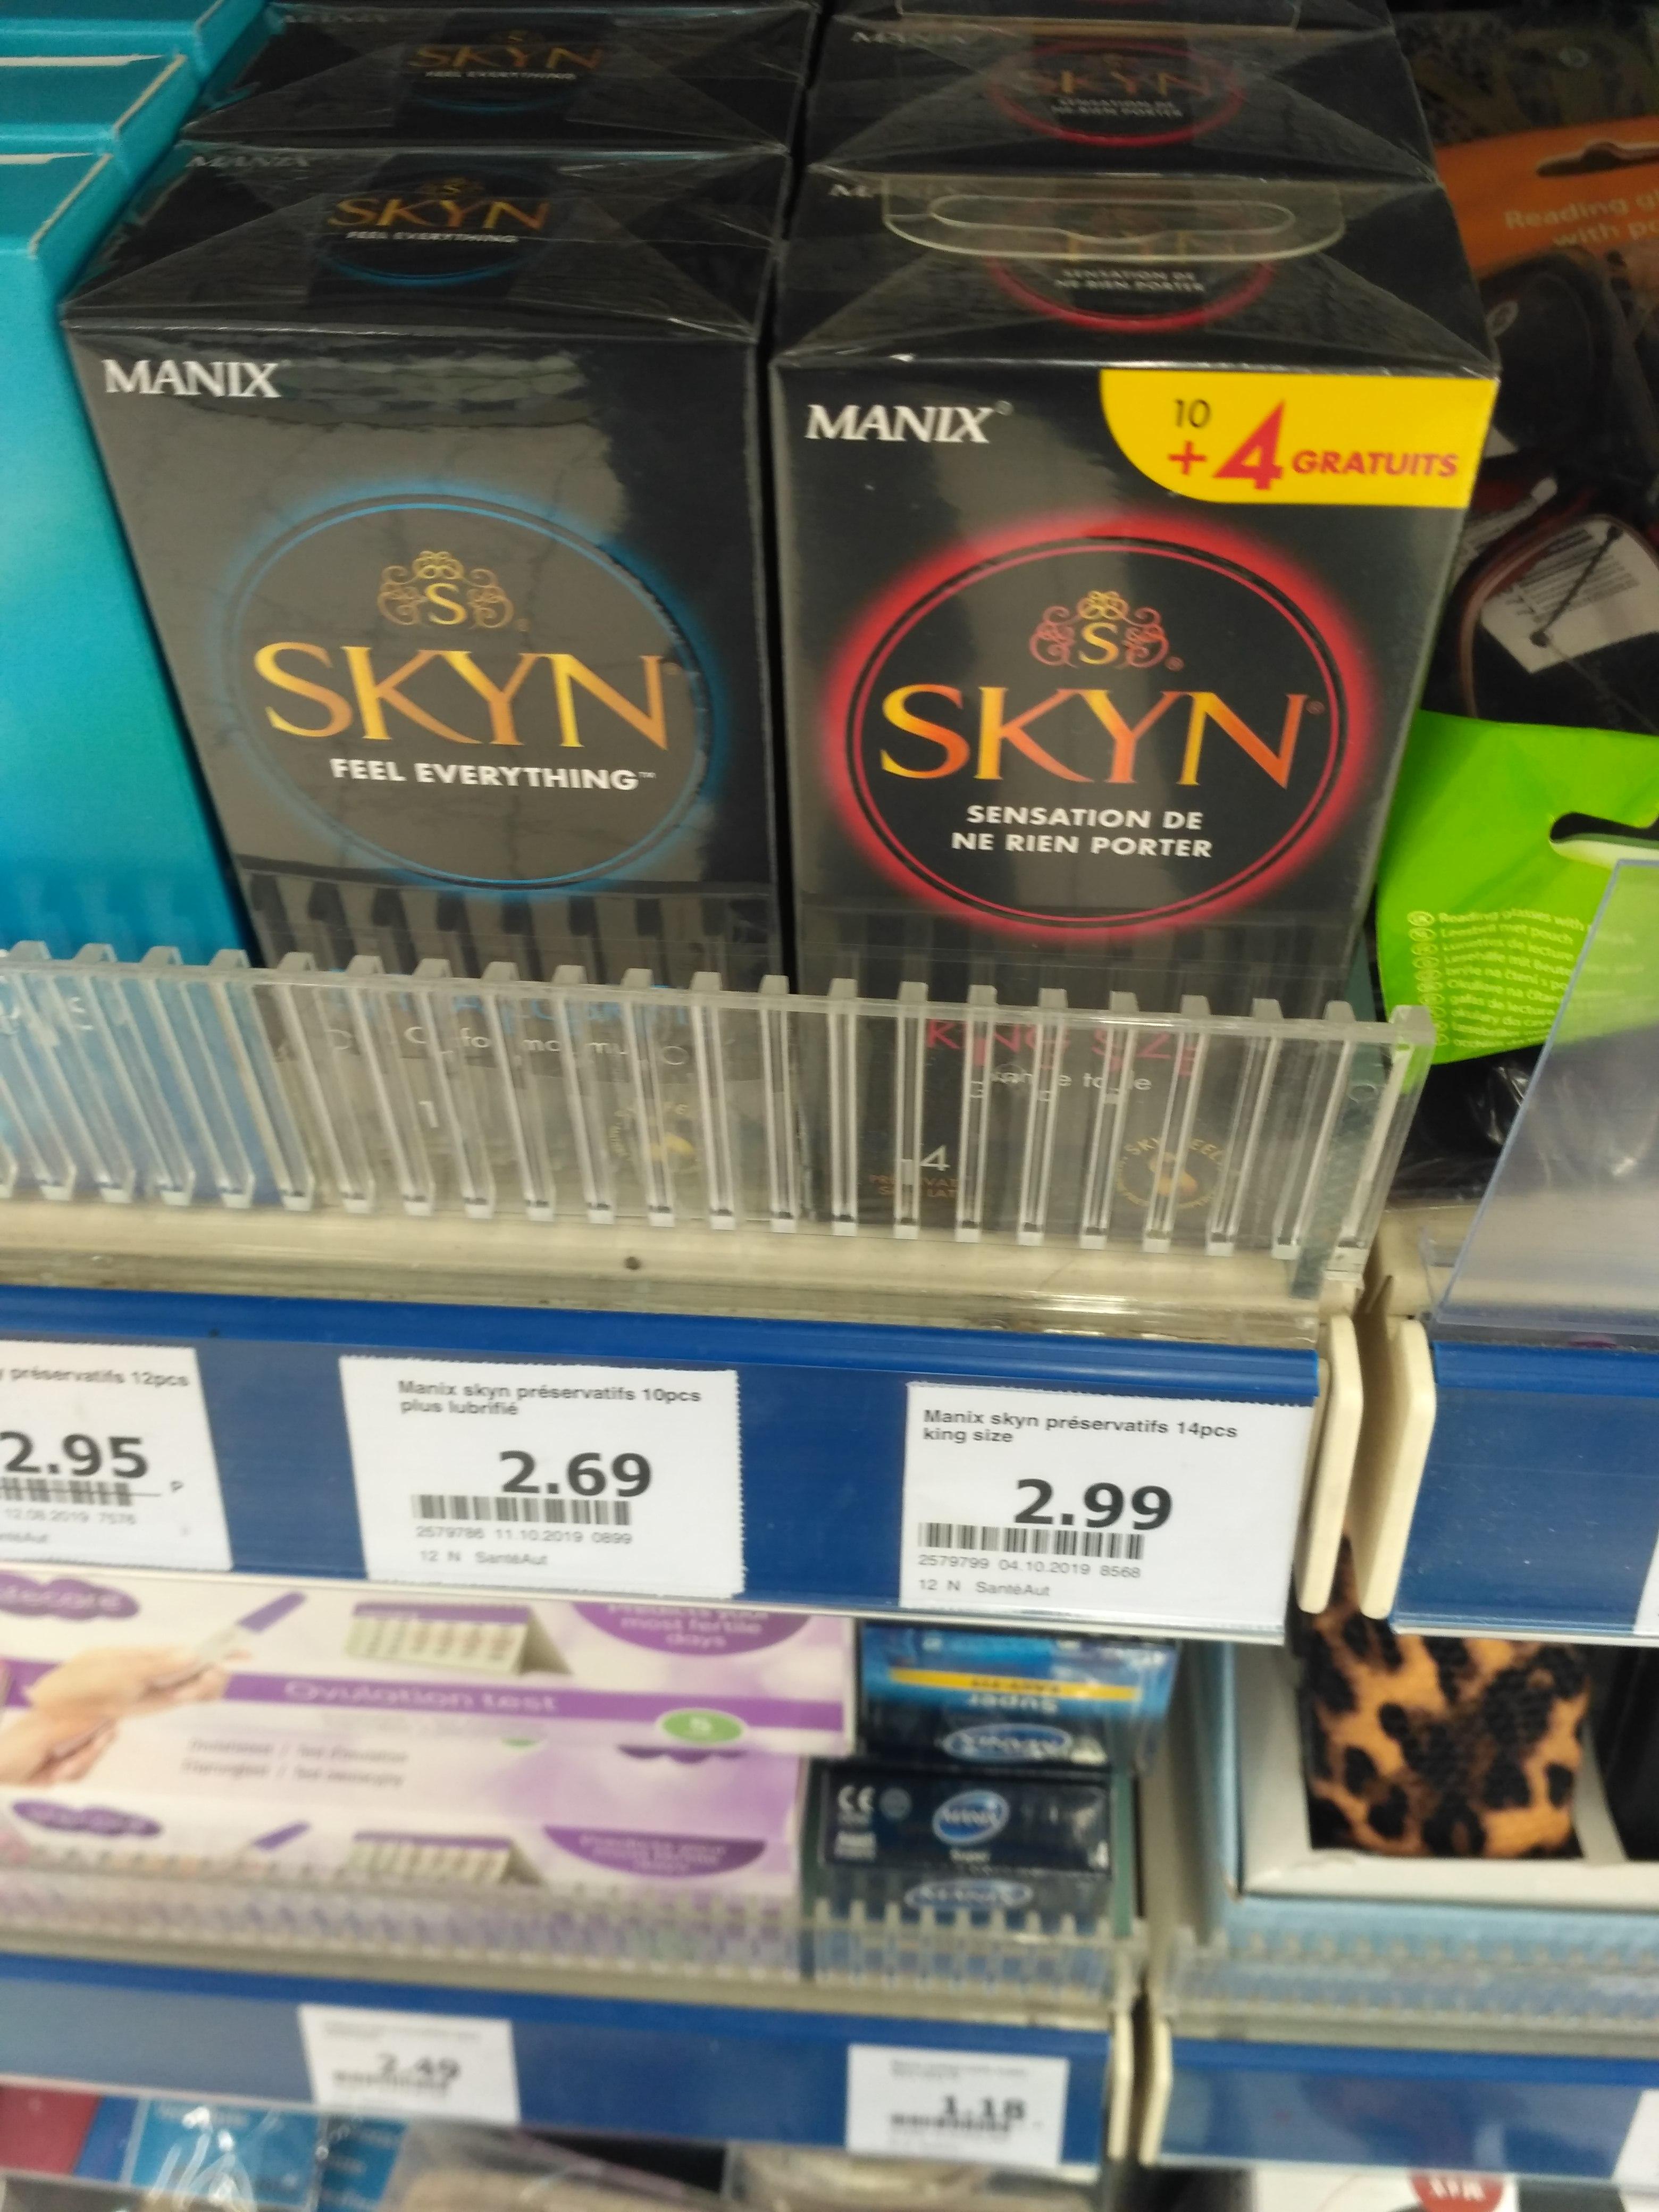 Boite de 14 preservatifs Skyn King Size - Vitré (35)